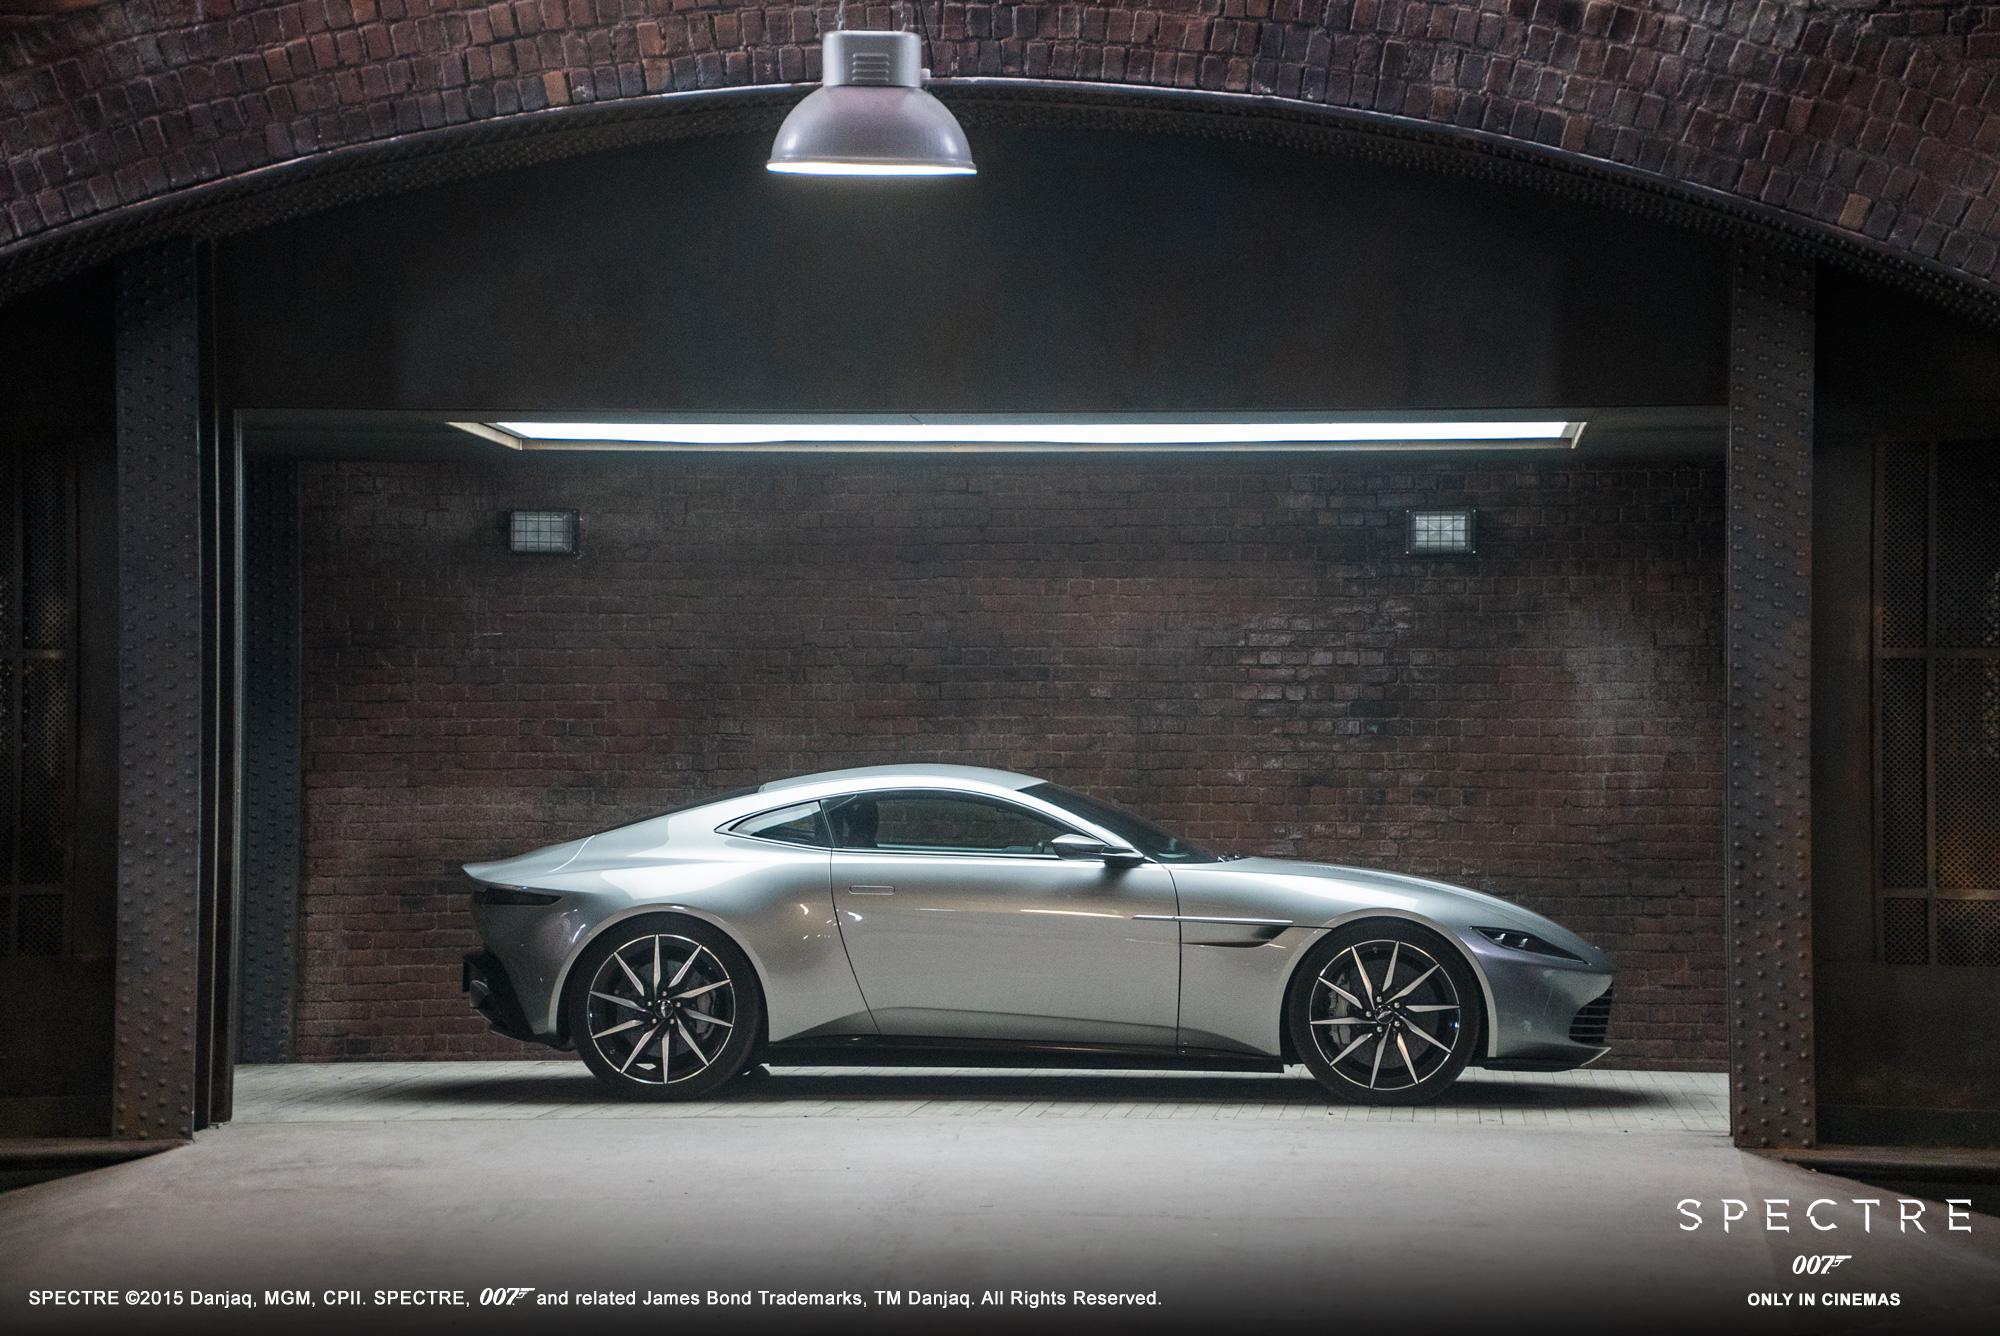 Aston Martin DB10 - Spectre 2015 - profil / side-face